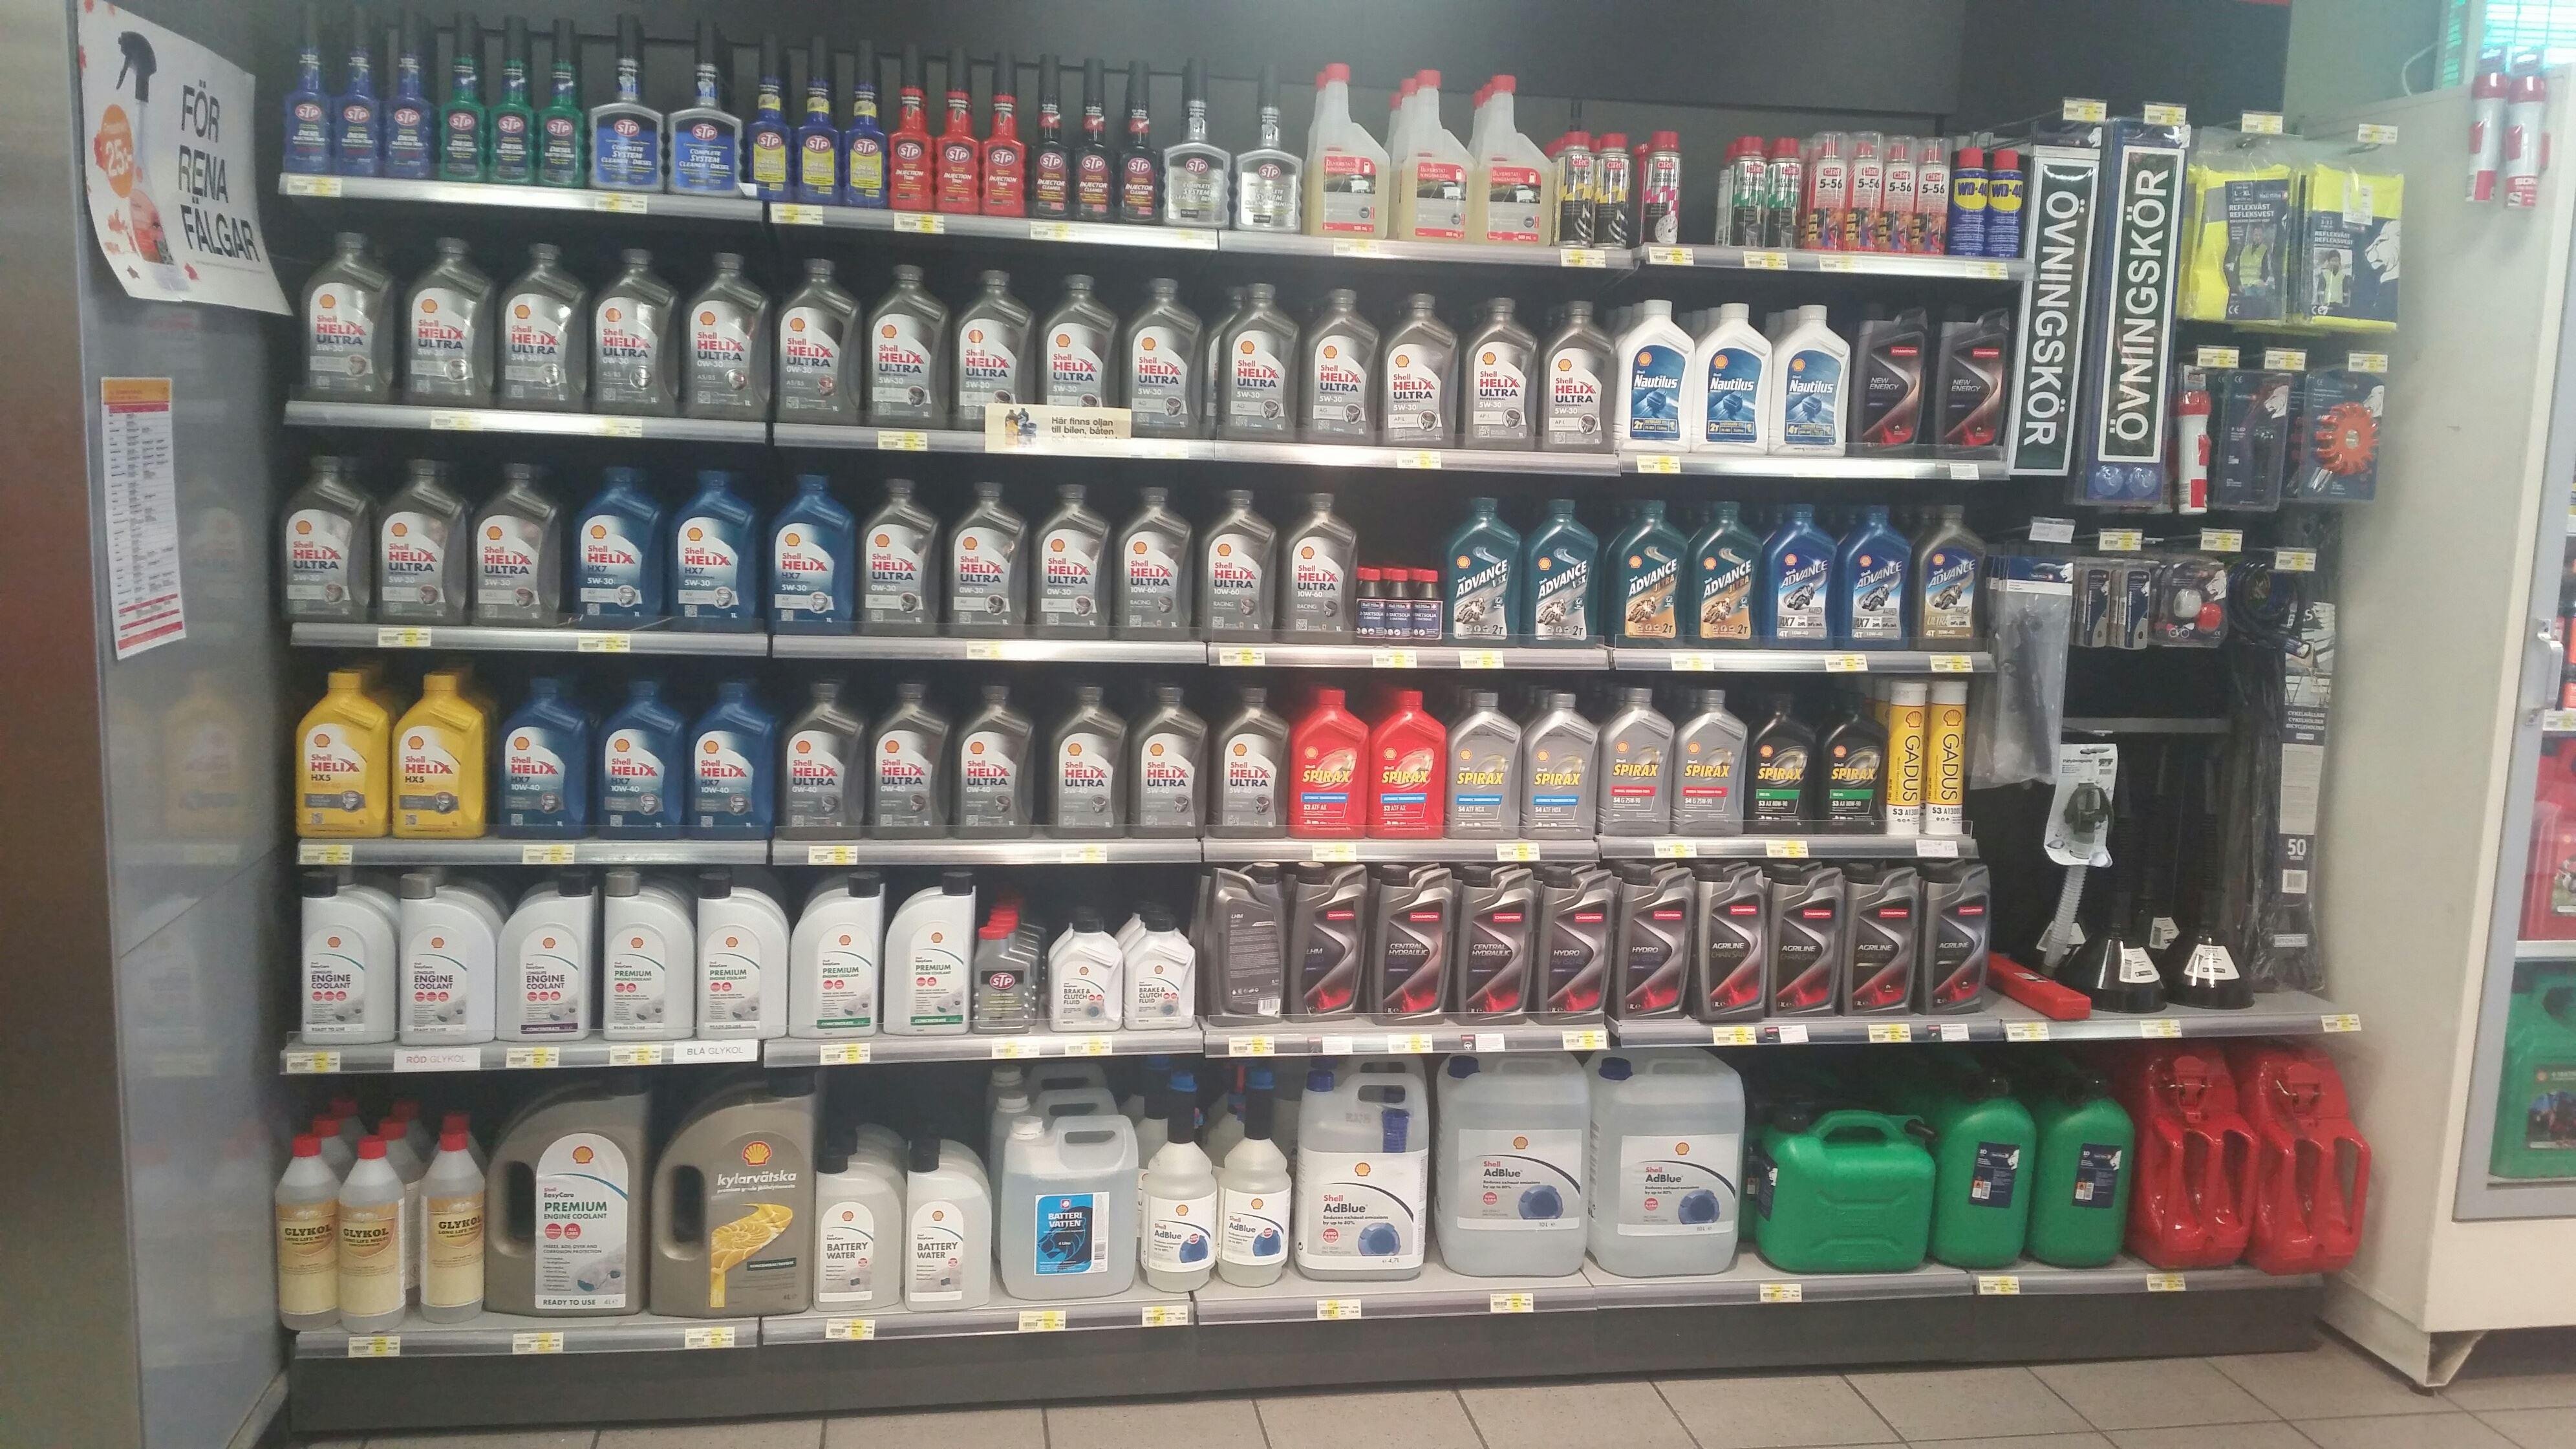 Shell /7-Eleven Löddeköpinge